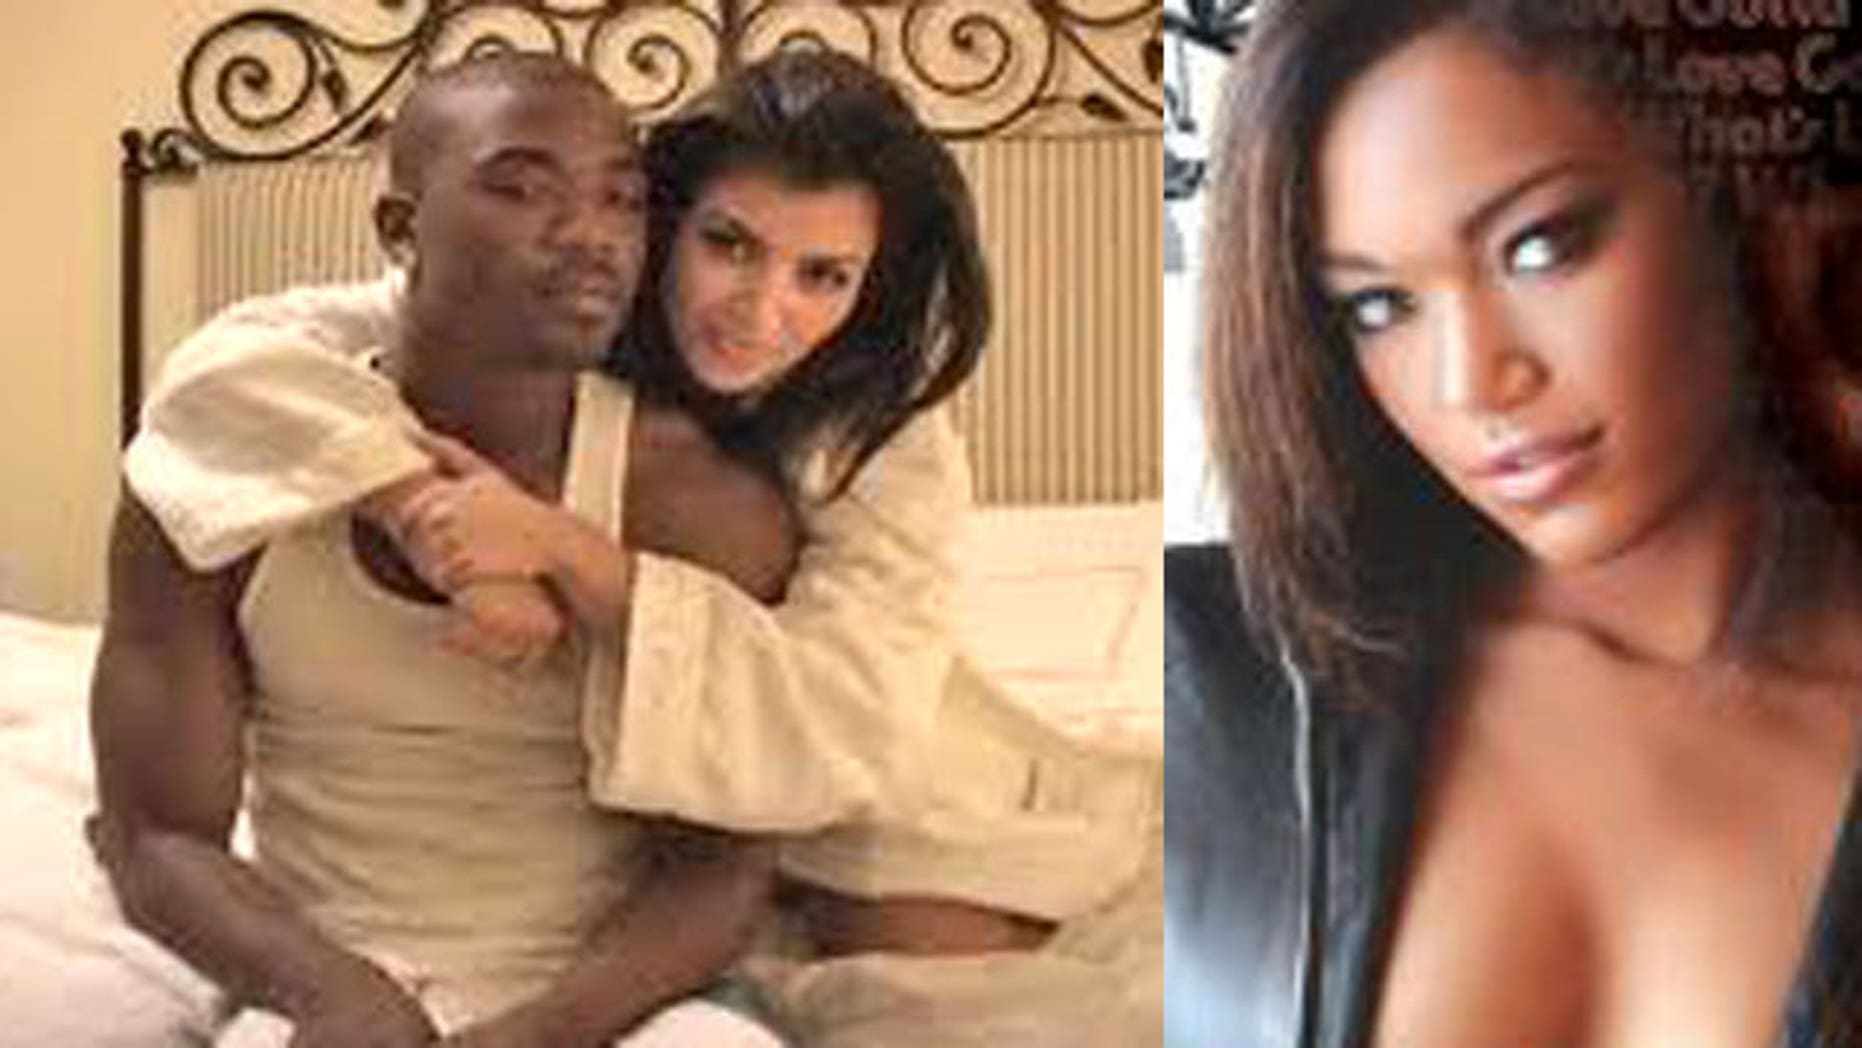 Kim Kardashian and Ray J and Montana Fishburne (right). (Vivid Entertainment)